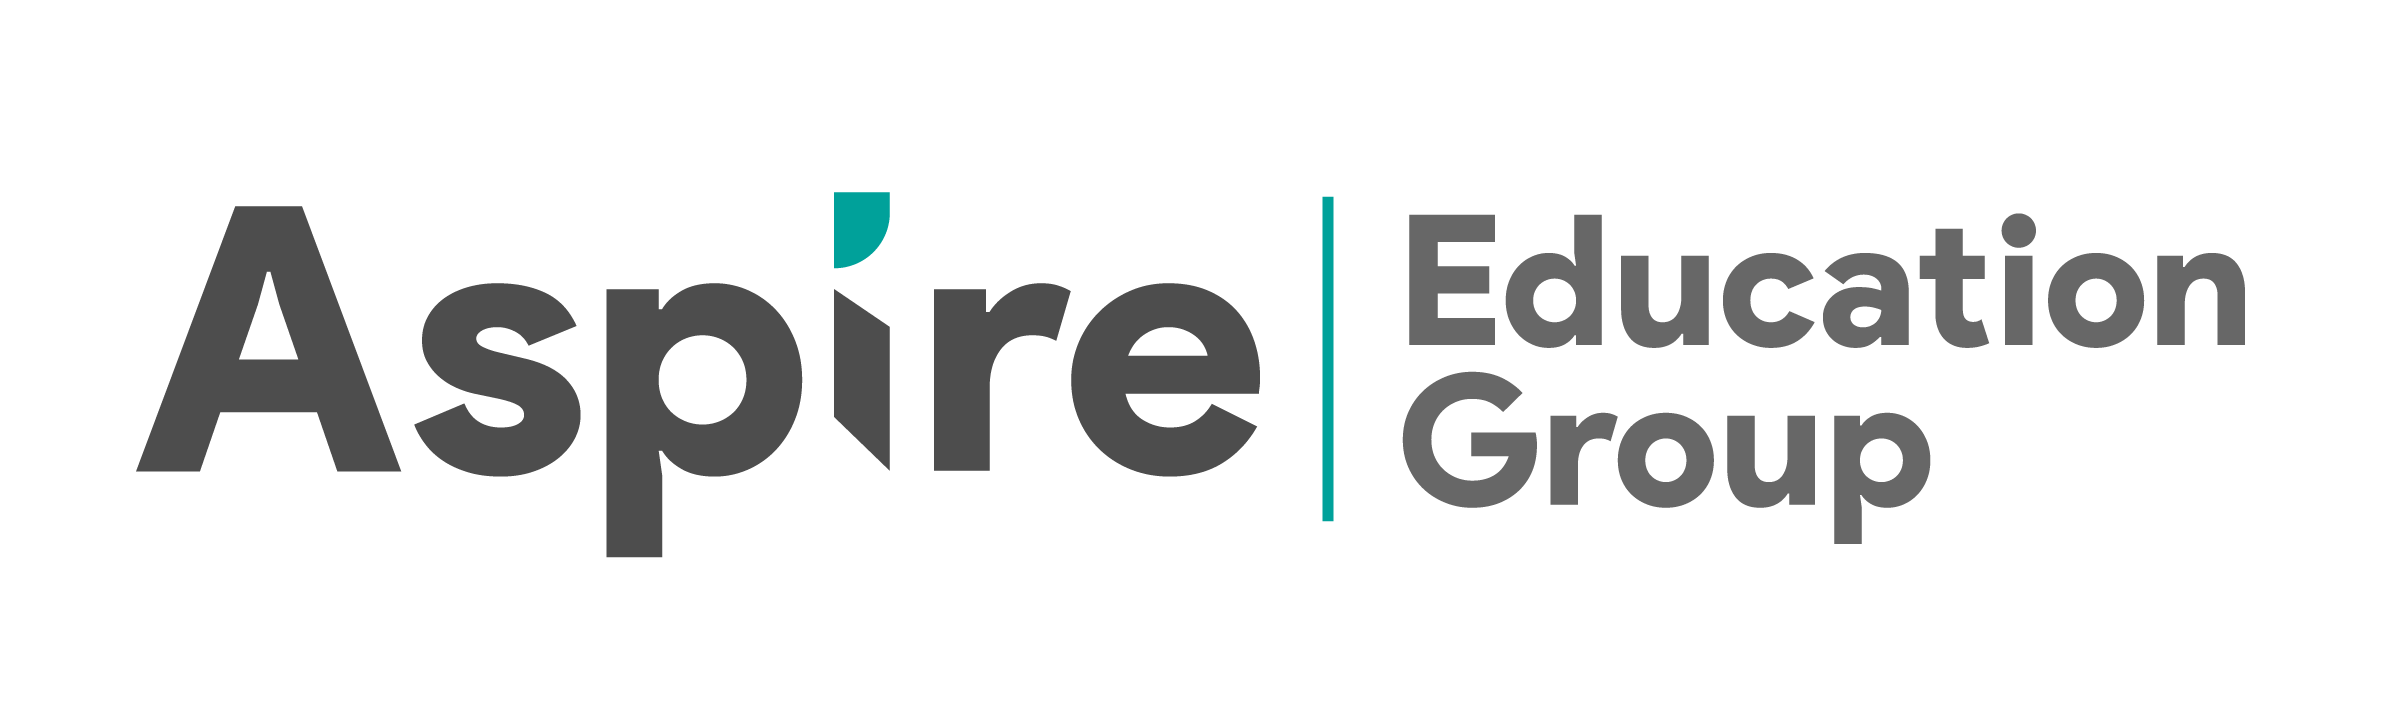 Aspire Education Group logo